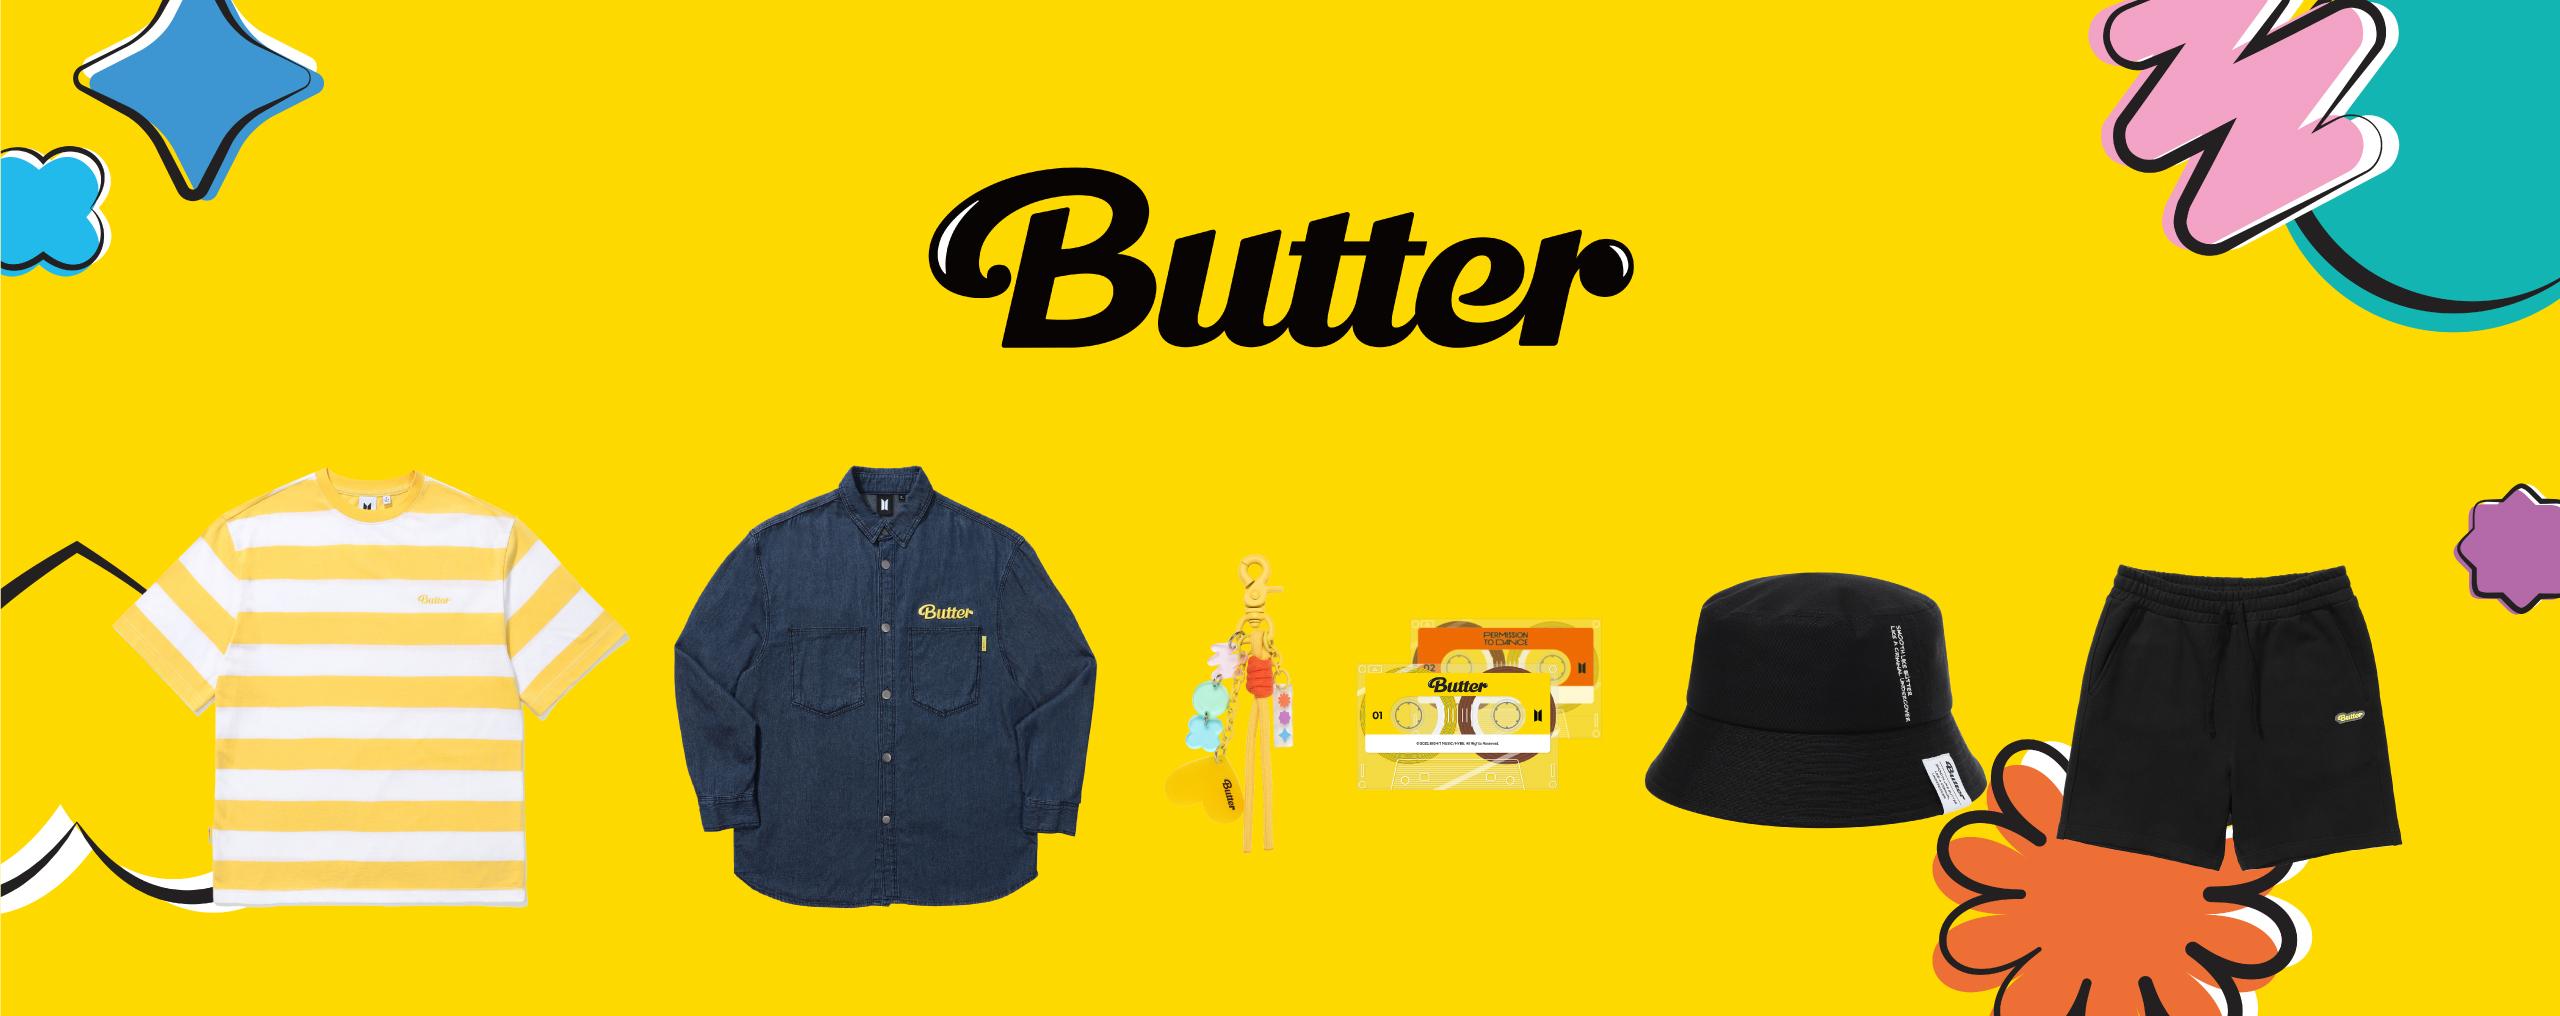 210718_BTS_BTS-Single-'Butter'-OFFICIAL-MERCHANDISE_FCPC_banner